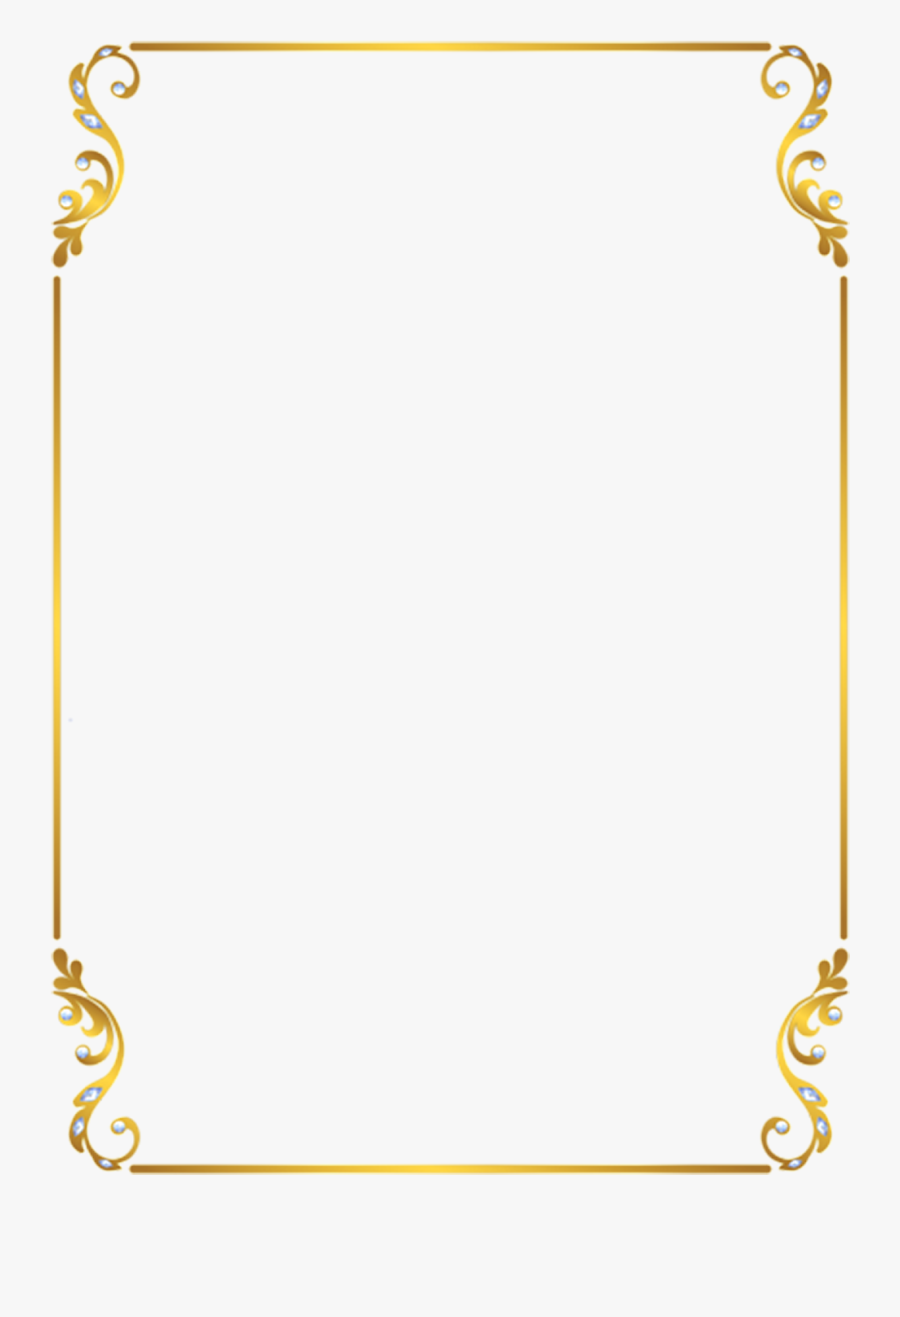 Transparent Medical Border Clipart - Golden Frame Border Png, Transparent Clipart